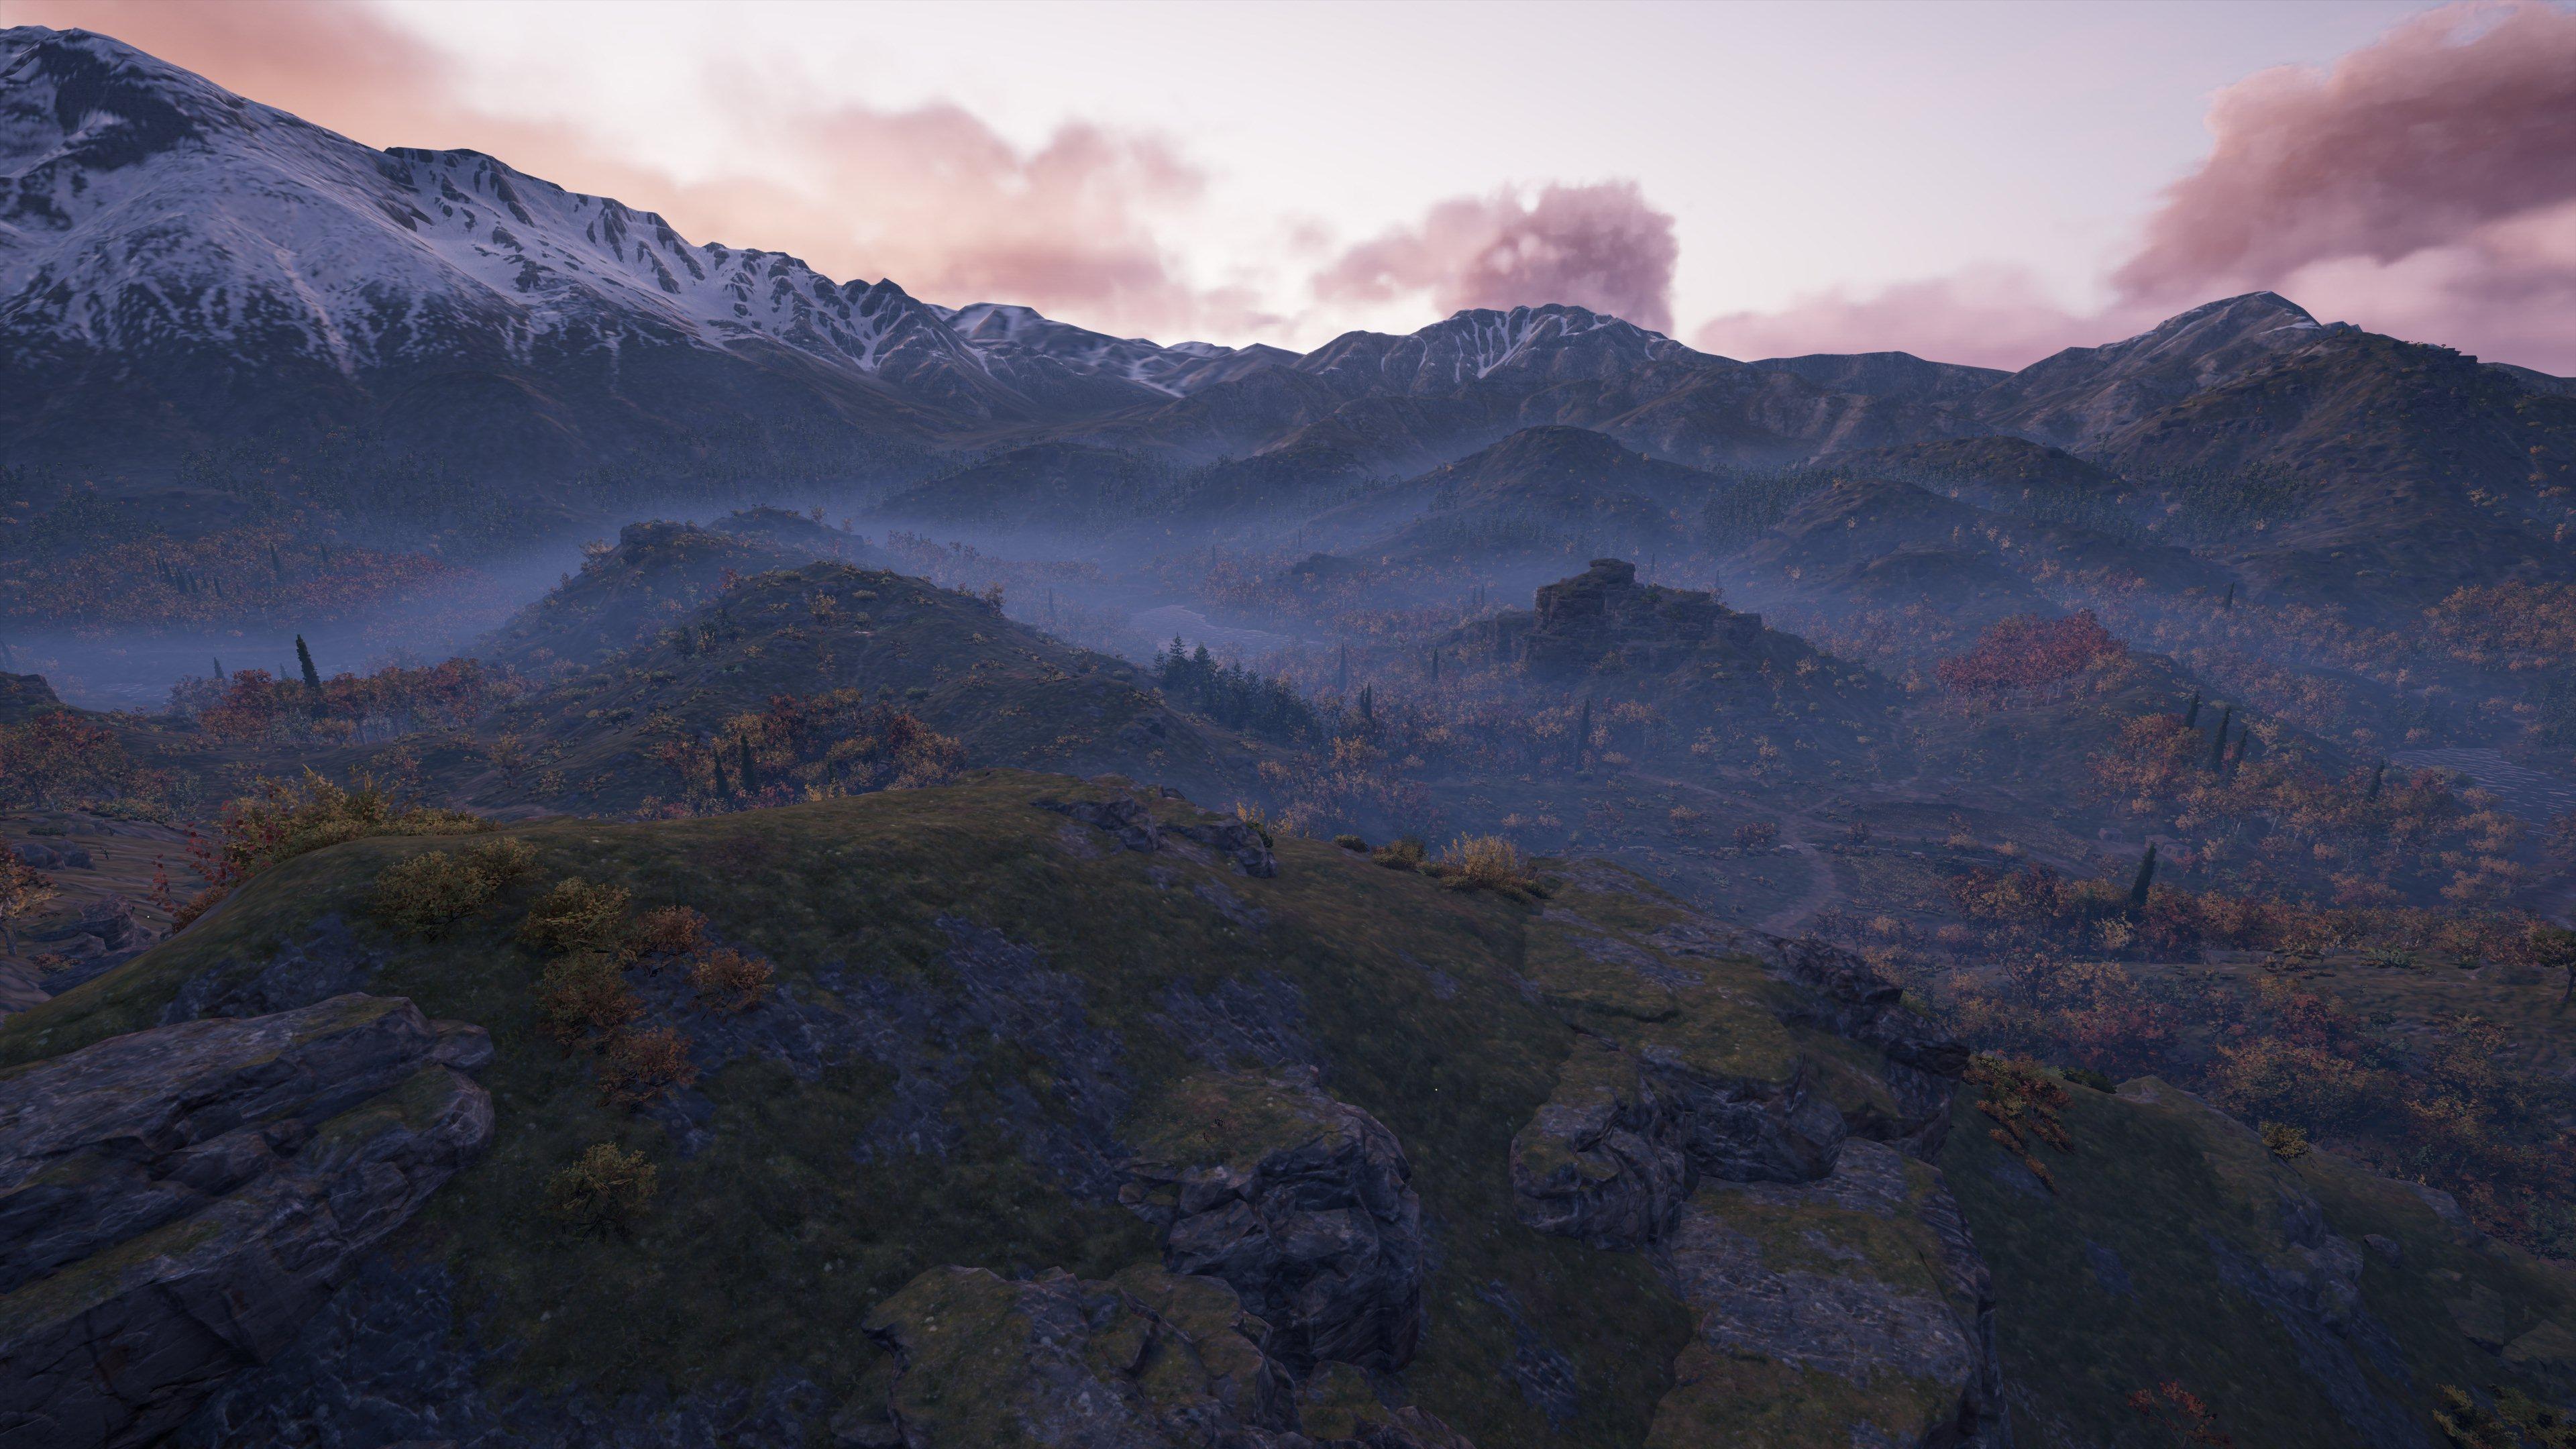 Unexplored Mount Pangeon